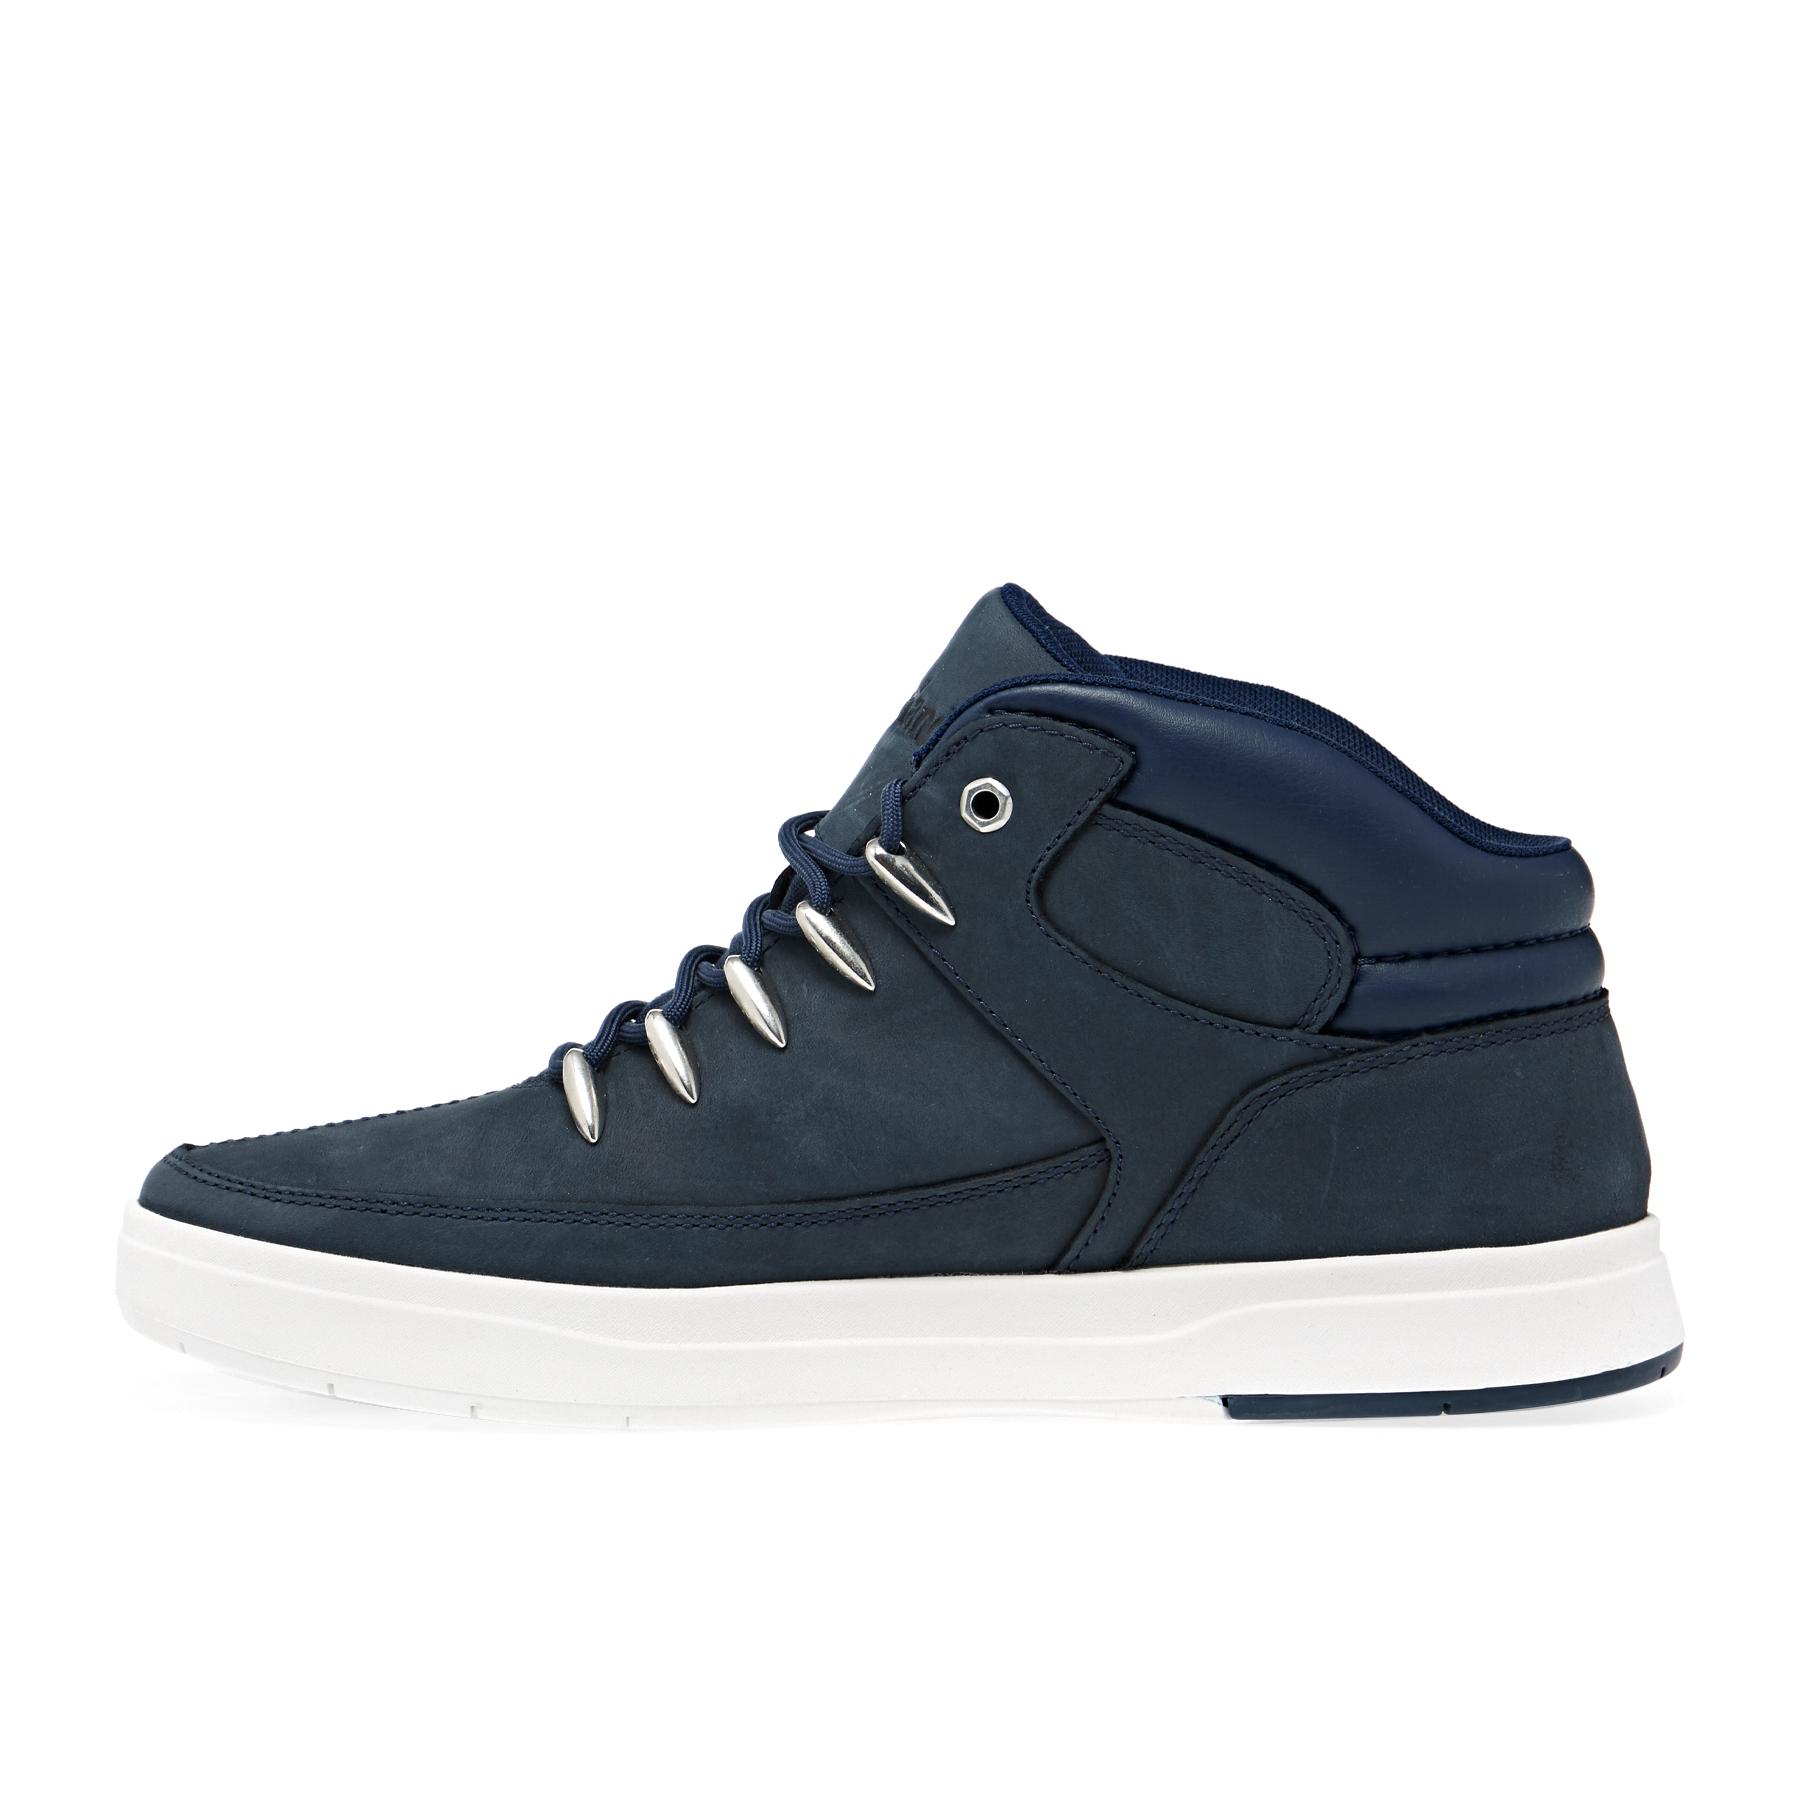 Timberland Davis Square Sneaker Men's